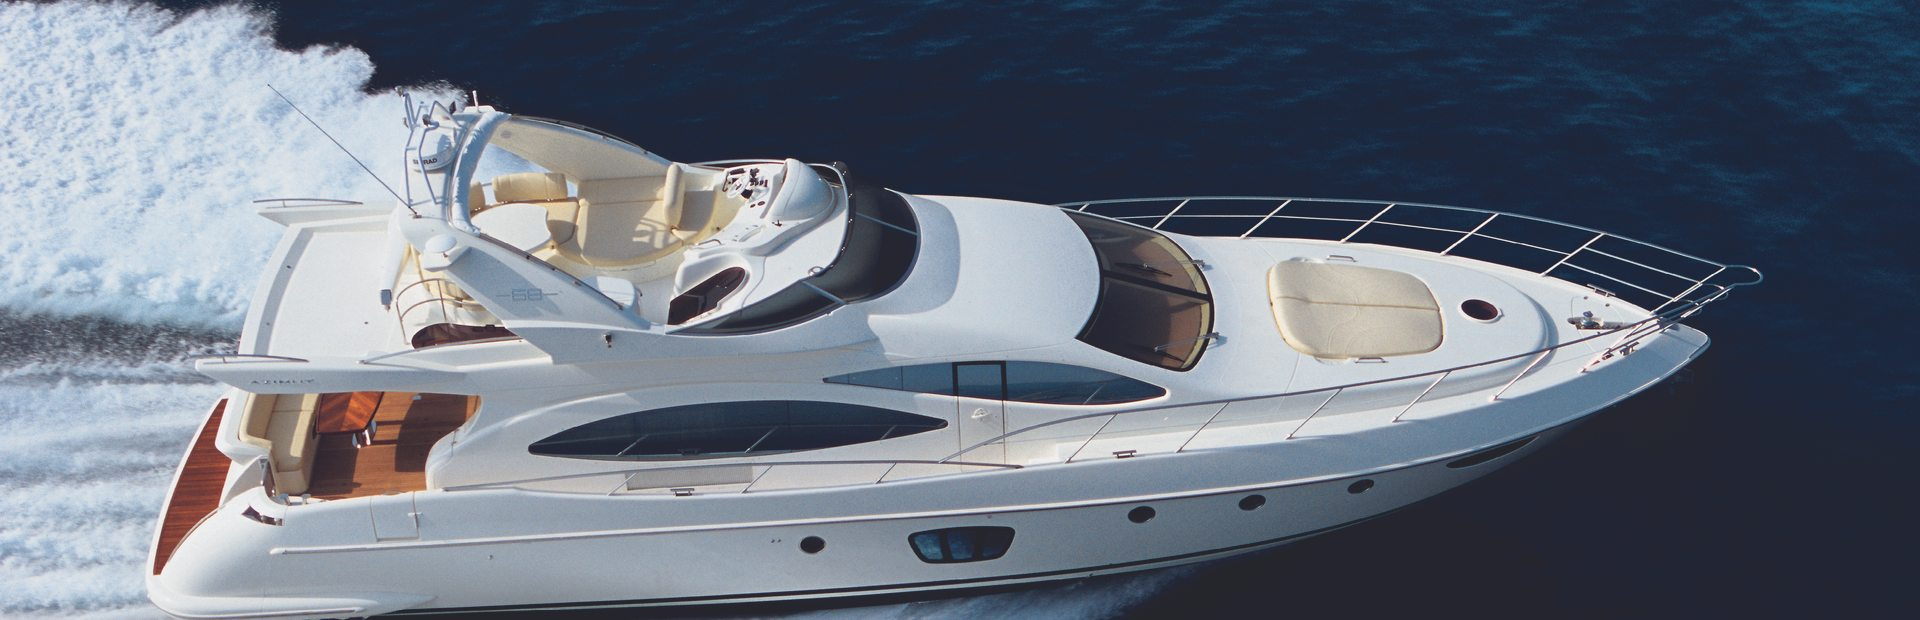 Azimut 68 Evolution Yacht Charter